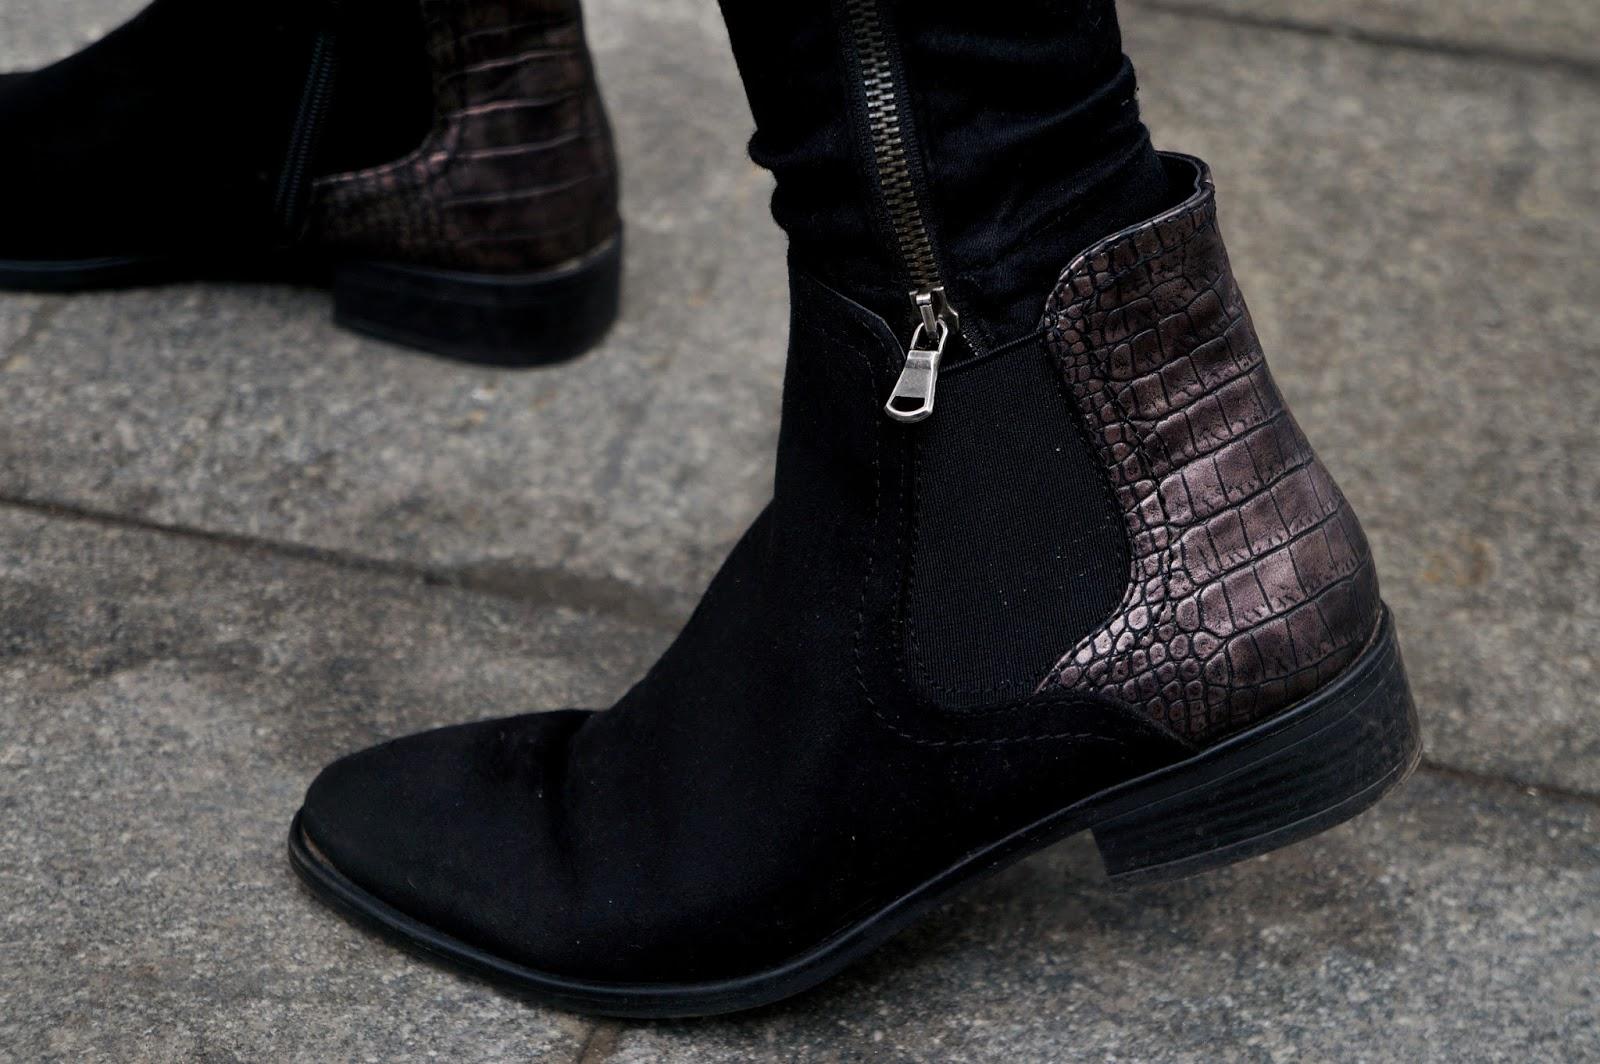 Chelsea boots | Deichmann